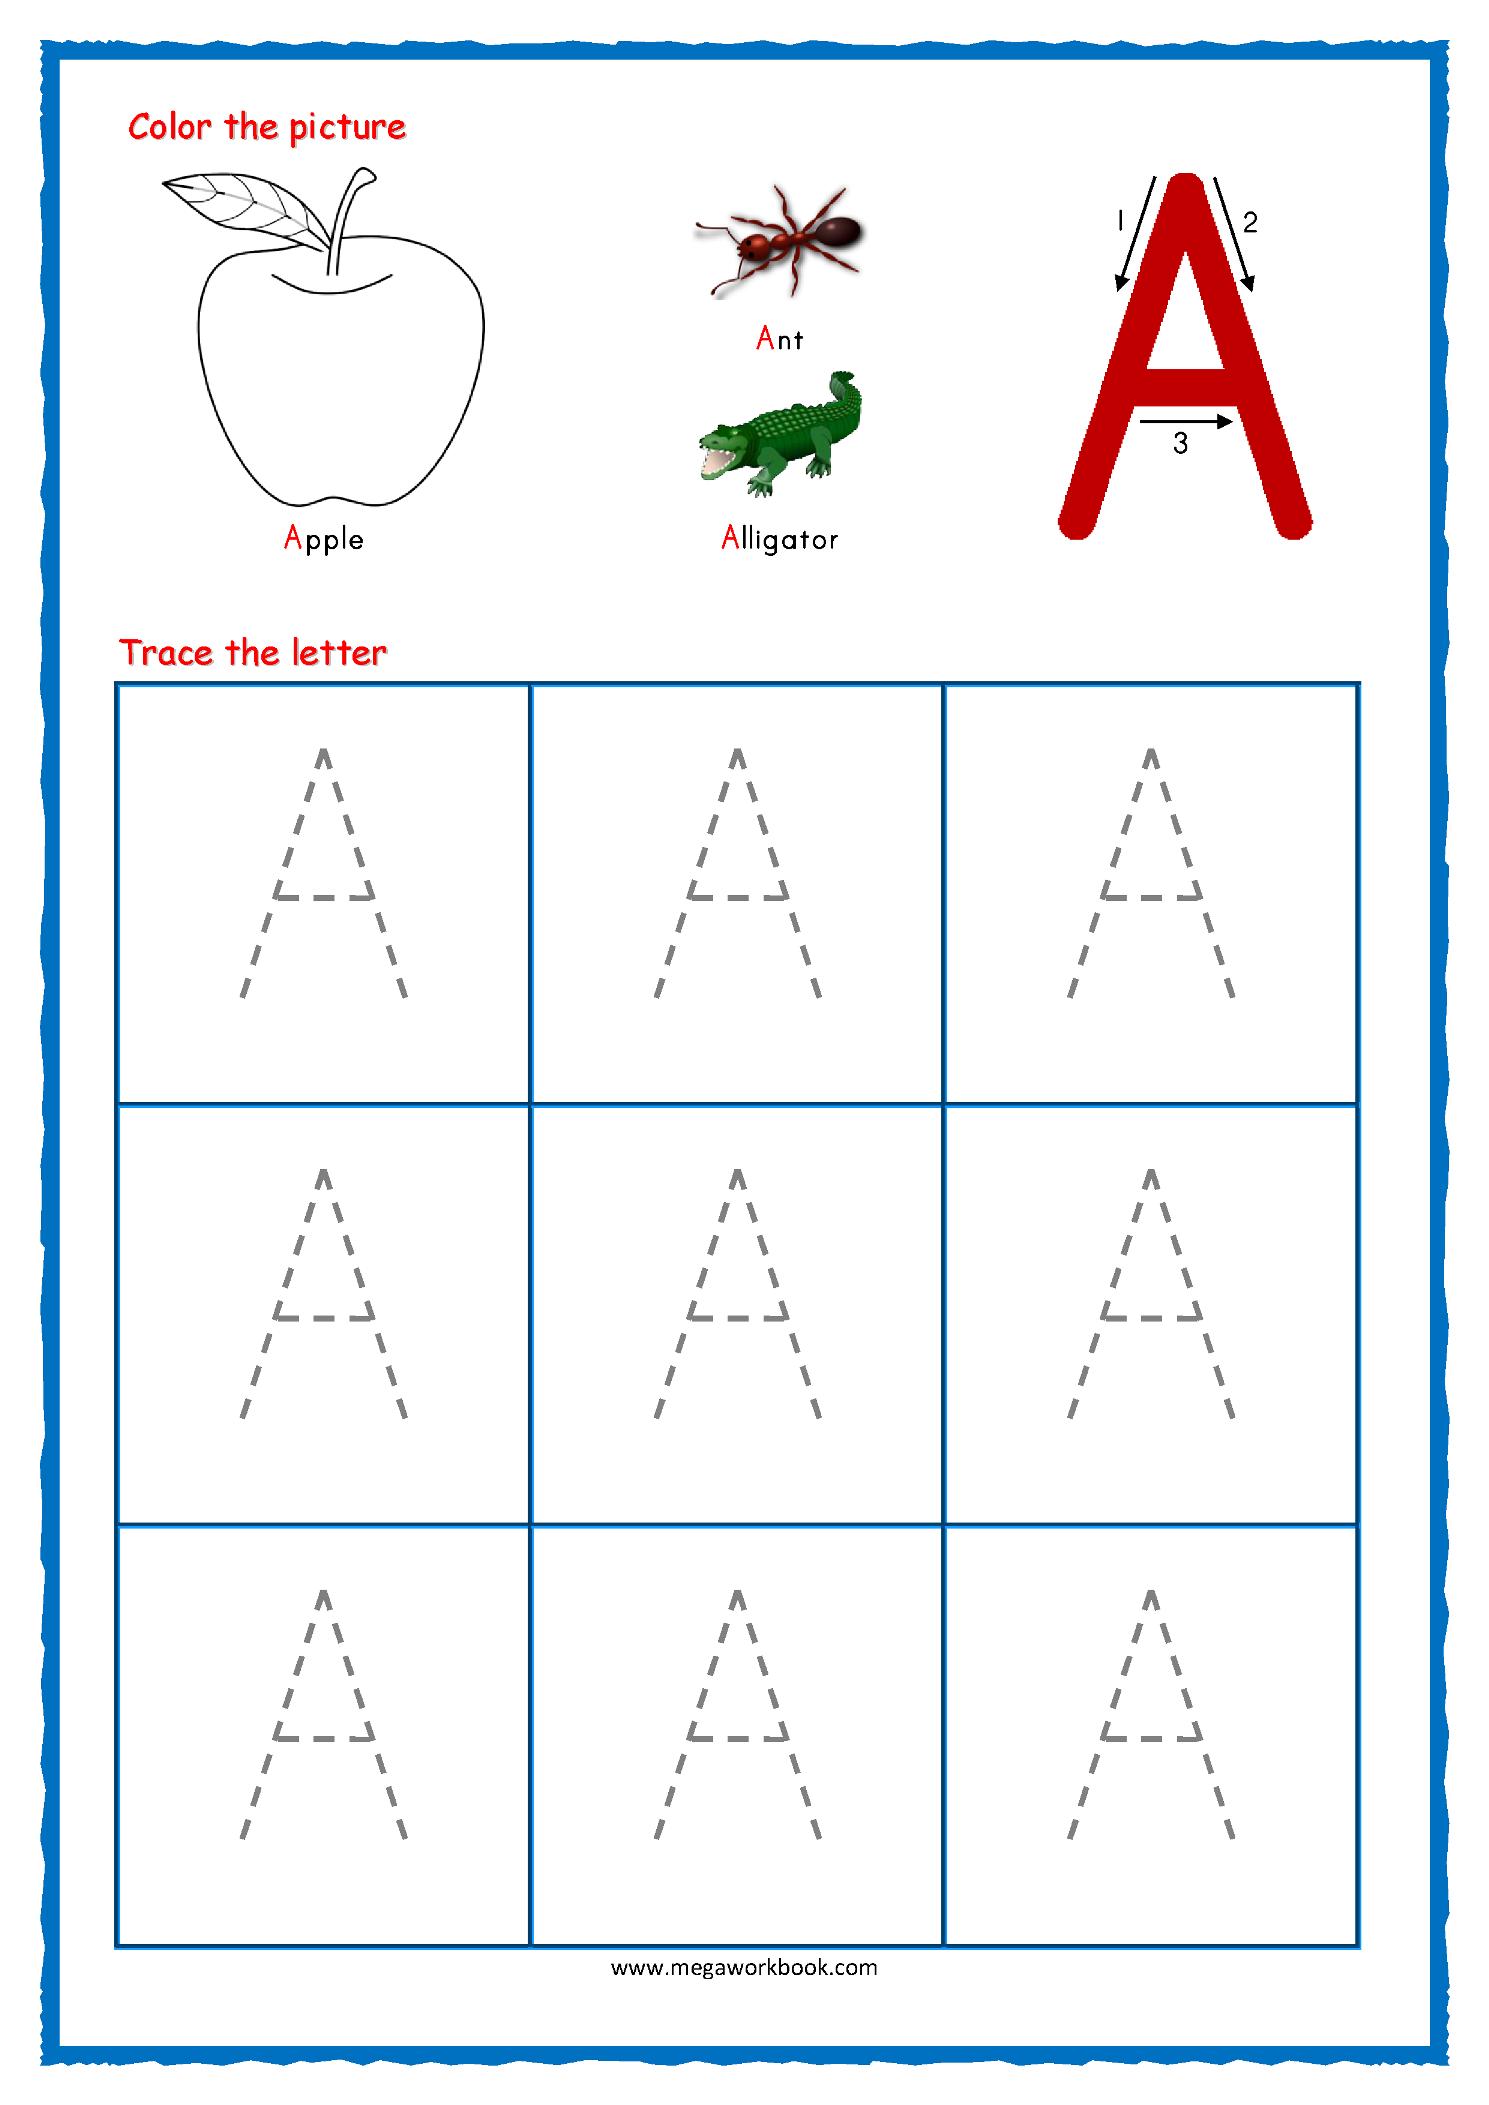 Worksheet ~ Tracing Lines Worksheet For Kids Basic Writing